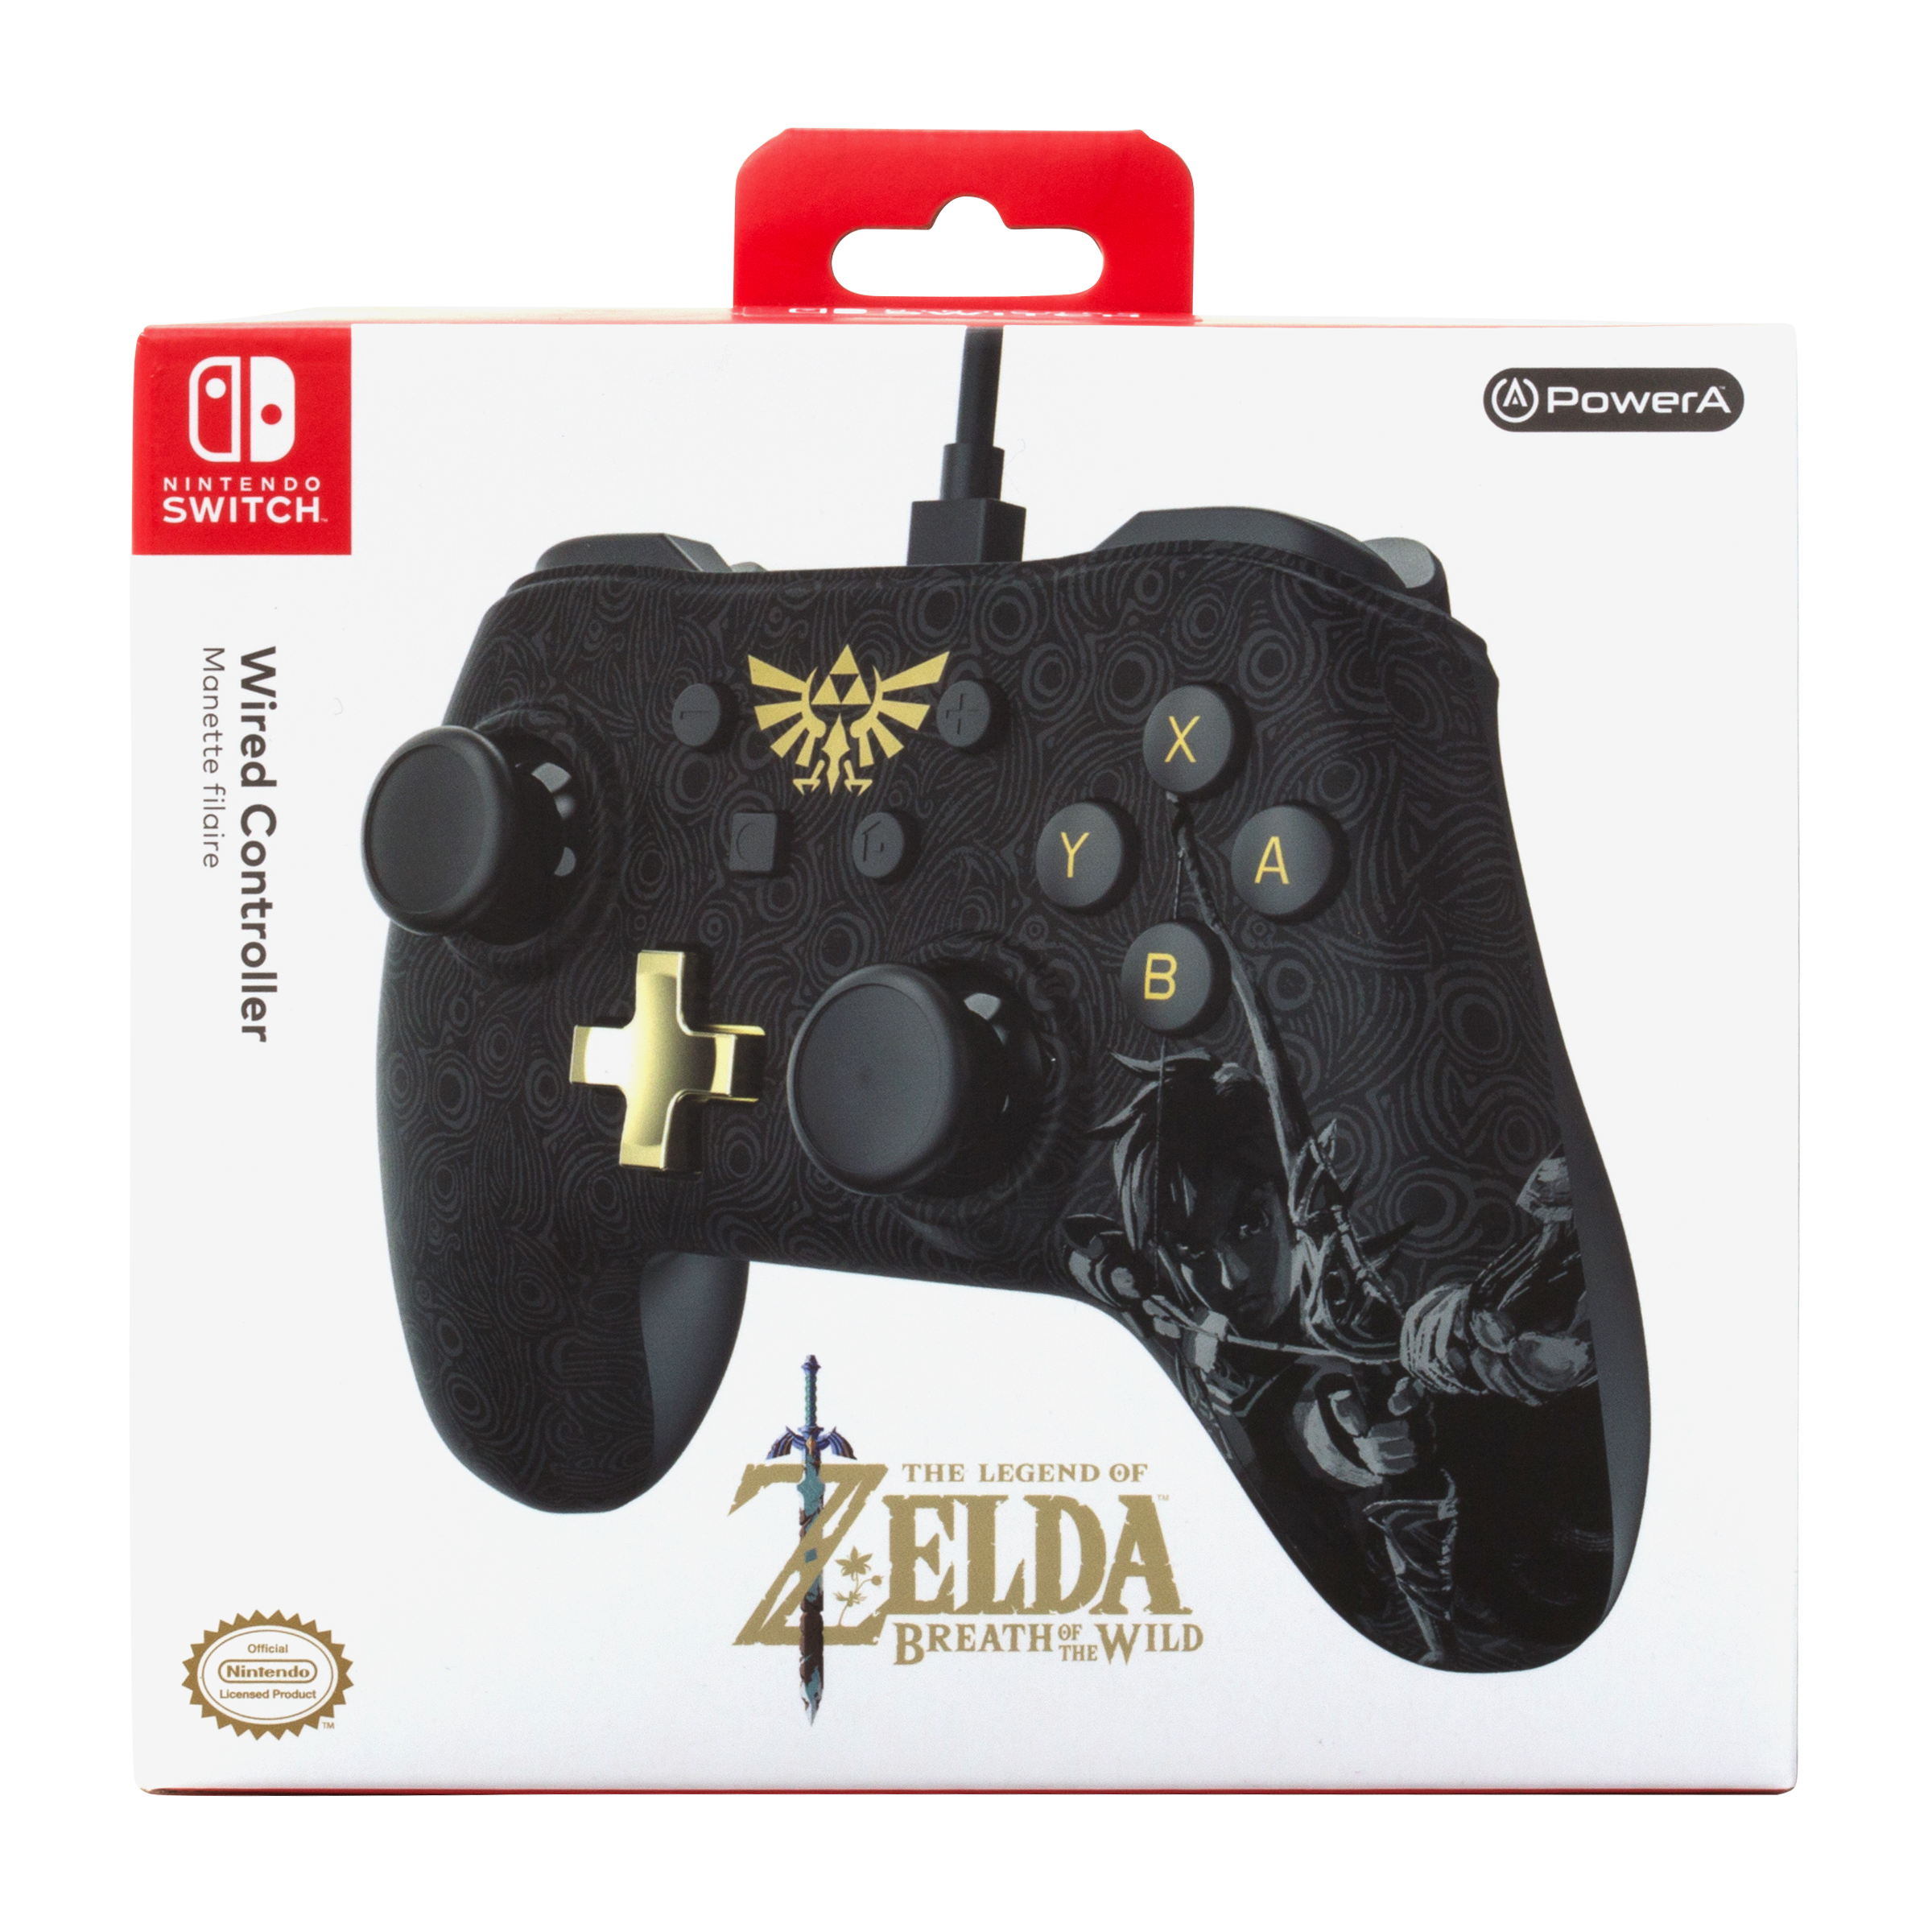 Powera Wired Controller For Nintendo Switch Zelda Breath Of The Wild Walmart Com Walmart Com